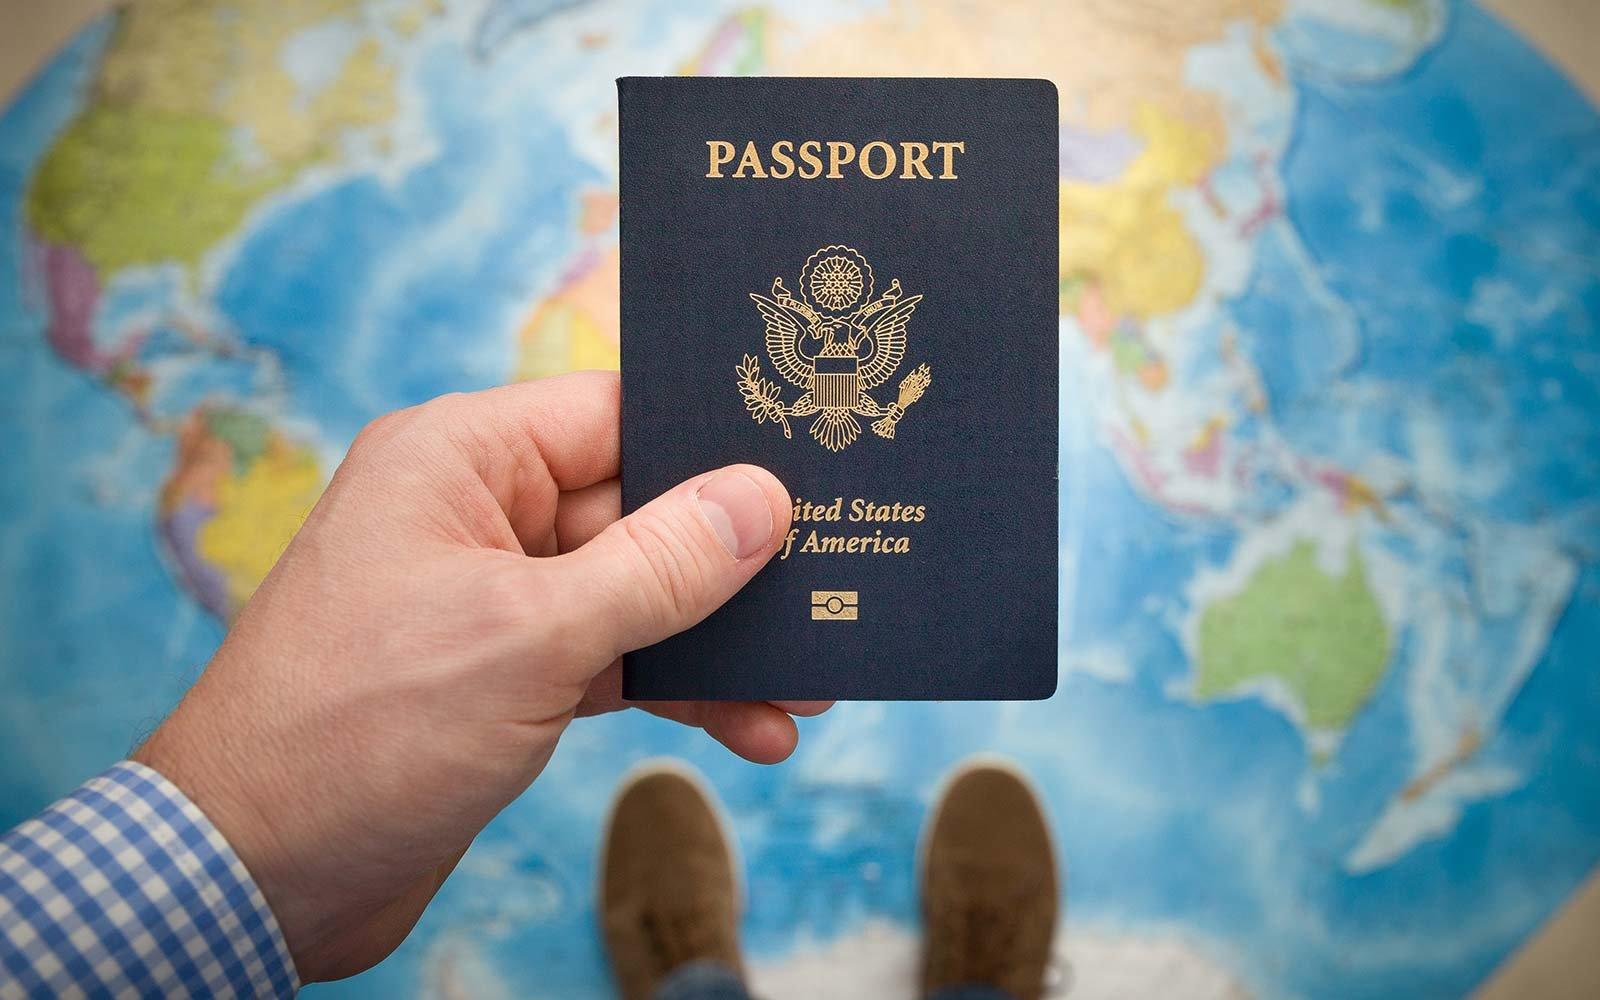 Hills Services Passport Services Passport Cedar